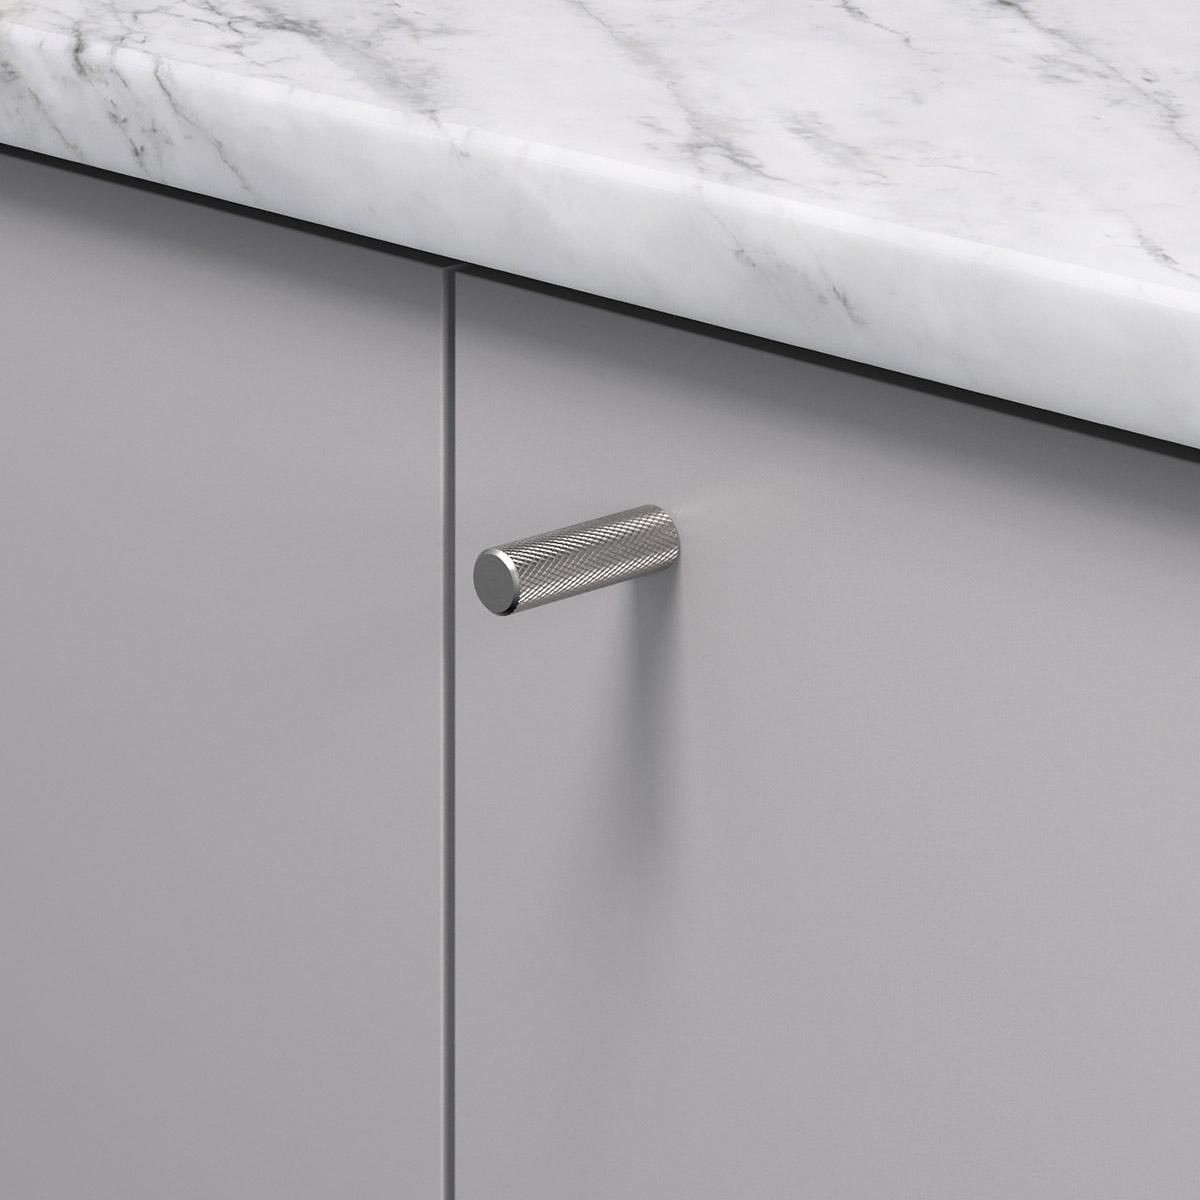 Knopp rostfri look 370225 11 10 mm ncs s 4500 n marmor carrara